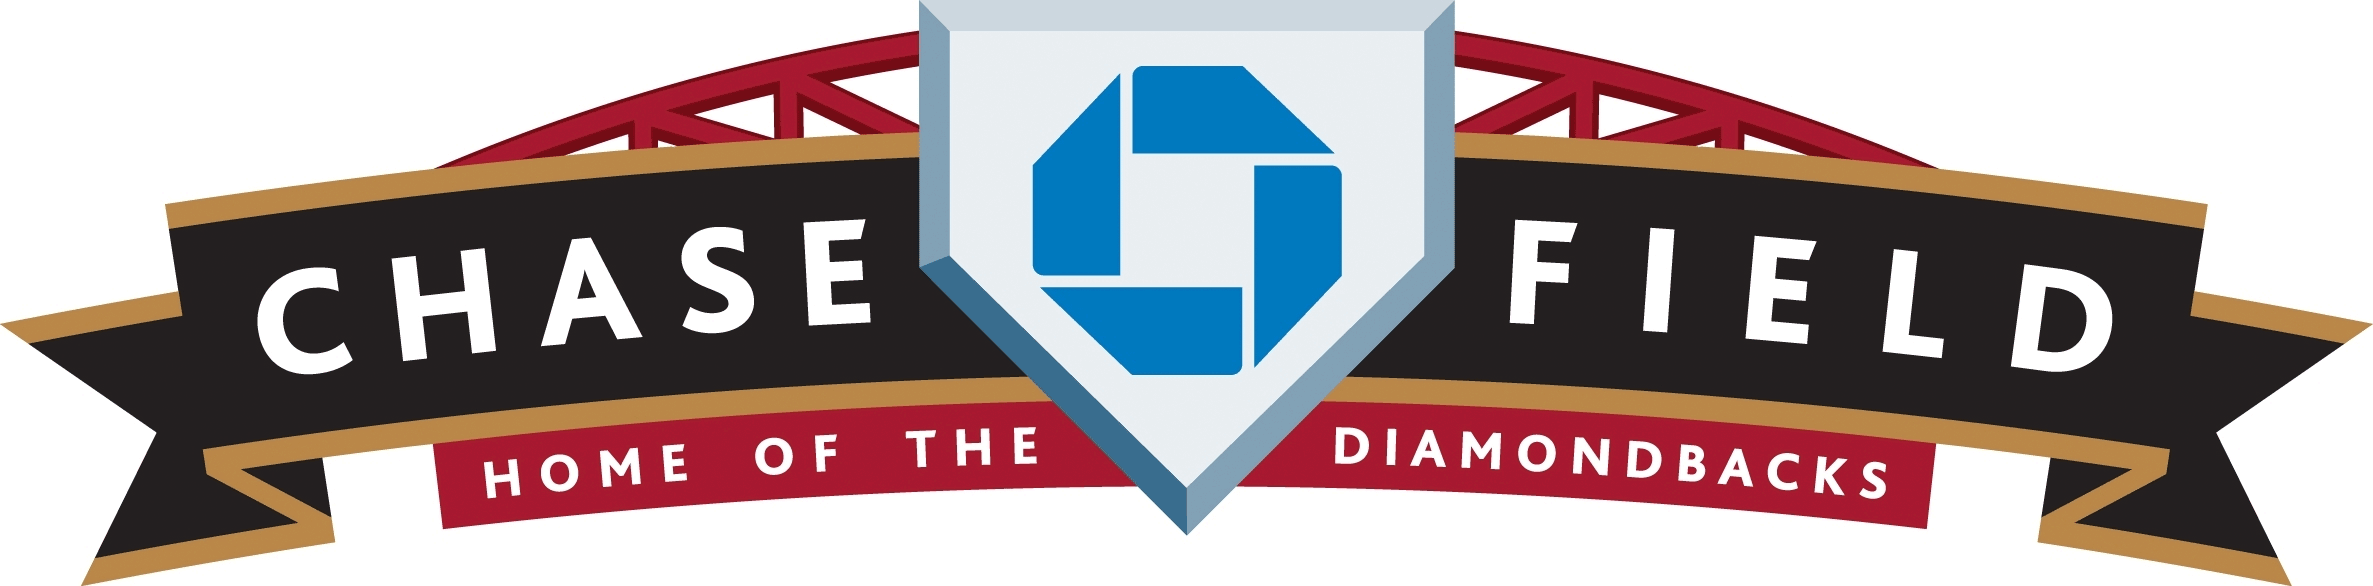 Arizona Diamondbacks Logo Stadium Logo (2007-Pres) - Chase Field logo - home stadium of the Arizona Diamondbacks SportsLogos.Net